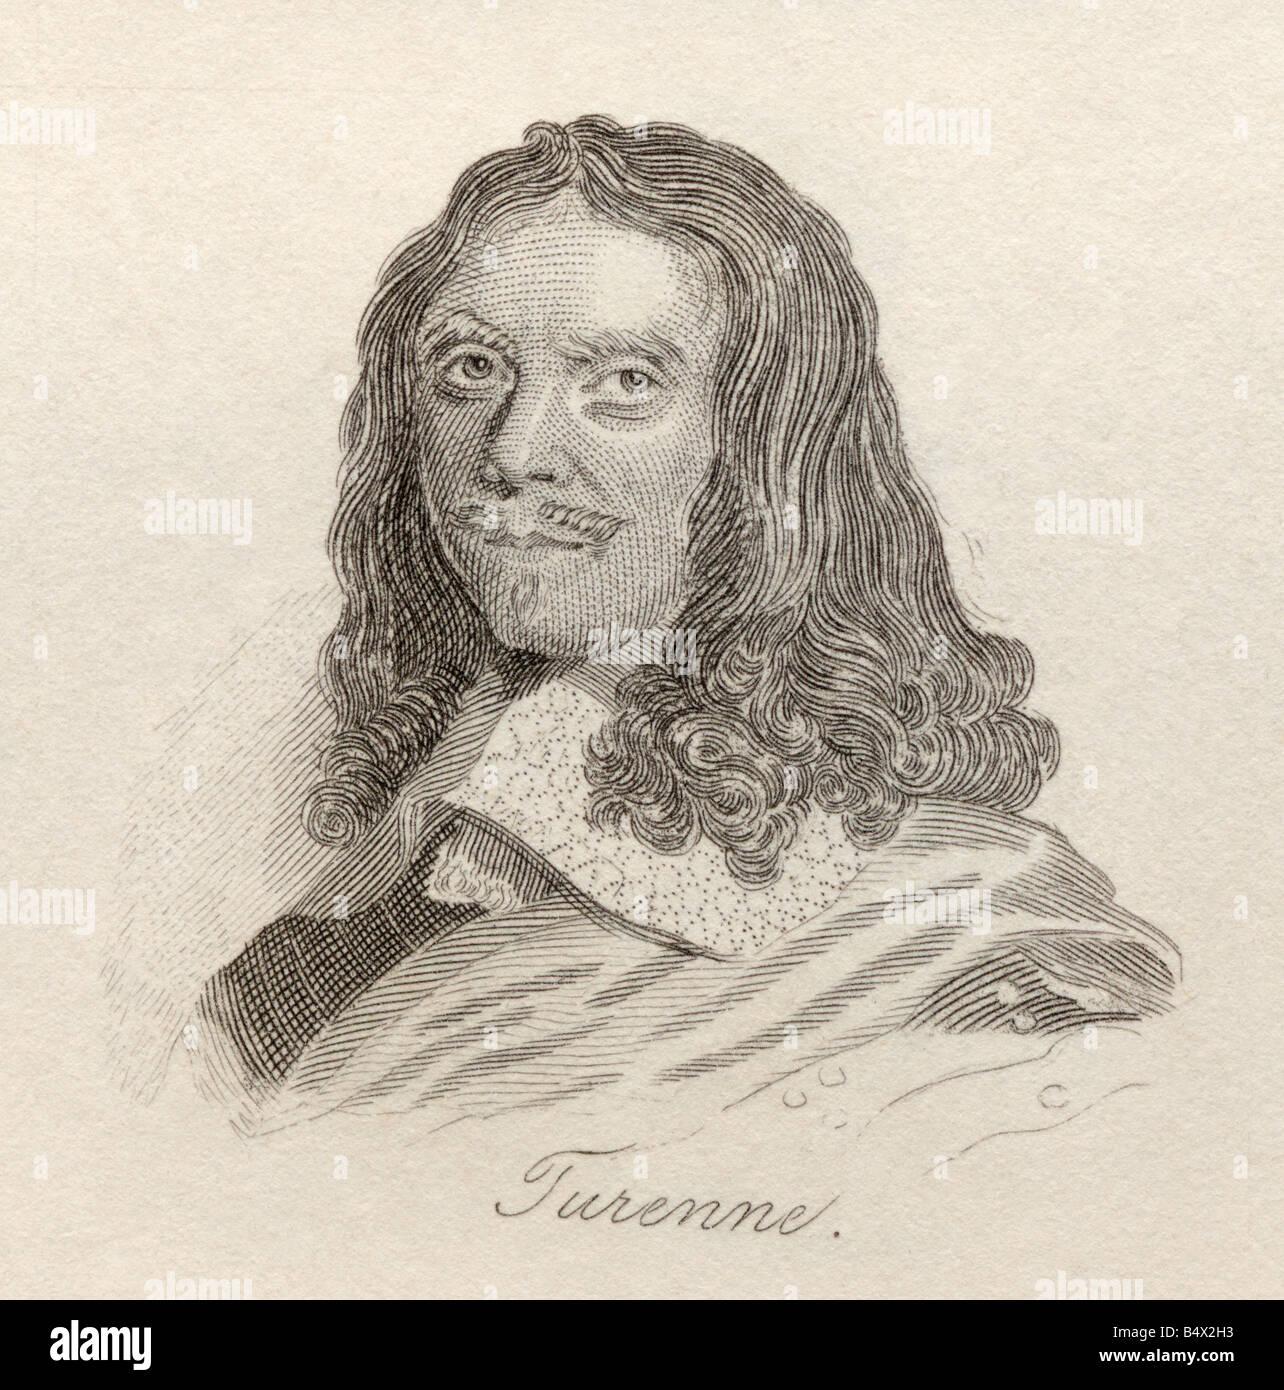 Henri de la Tour d Auvergne Vicomte de Turenne 1611 to 1675 French military leader and Marshal of France - Stock Image